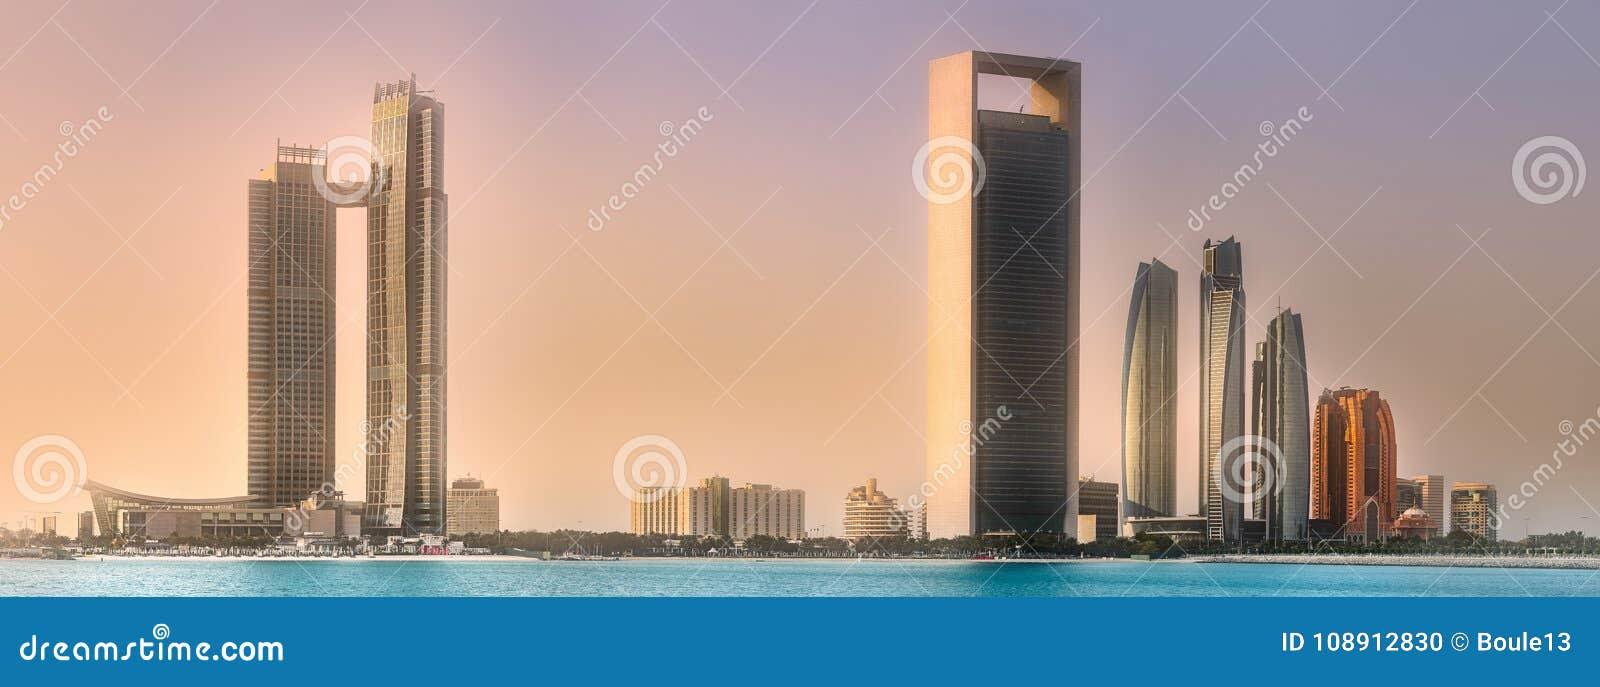 View of Abu Dhabi Skyline at sunrise, UAE